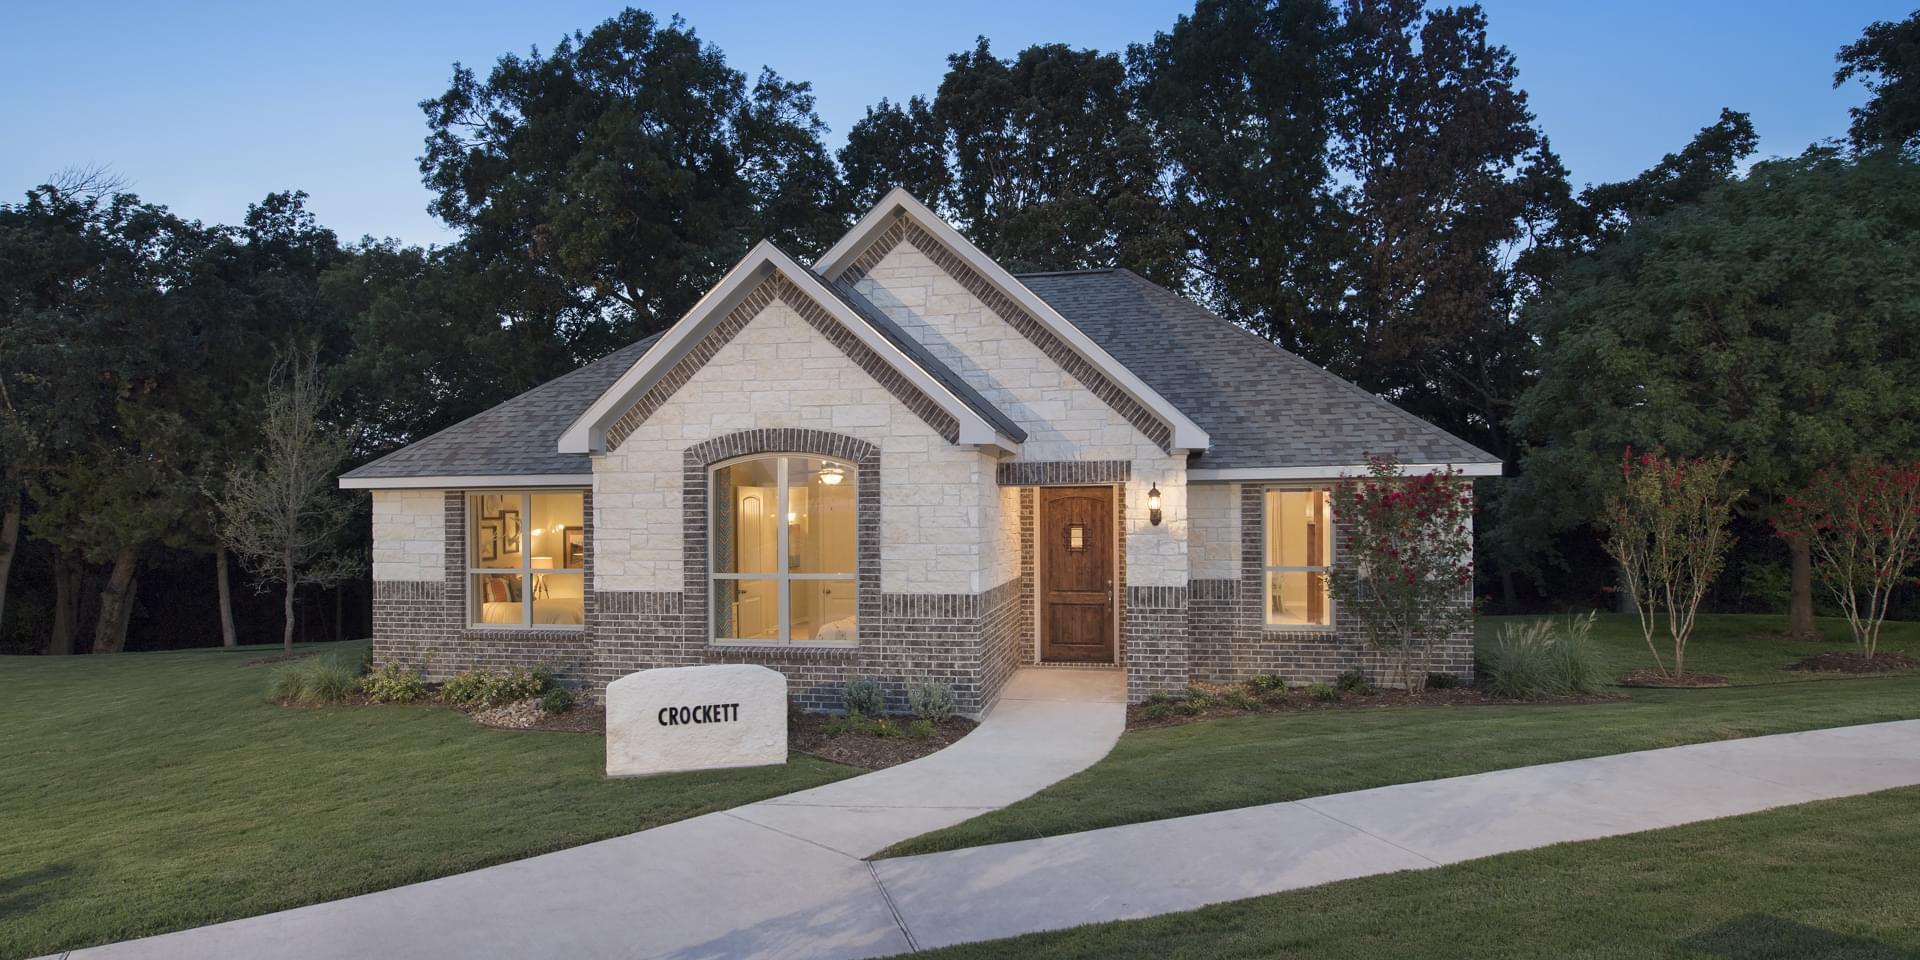 The Crockett Custom Home Plan from Tilson Homes